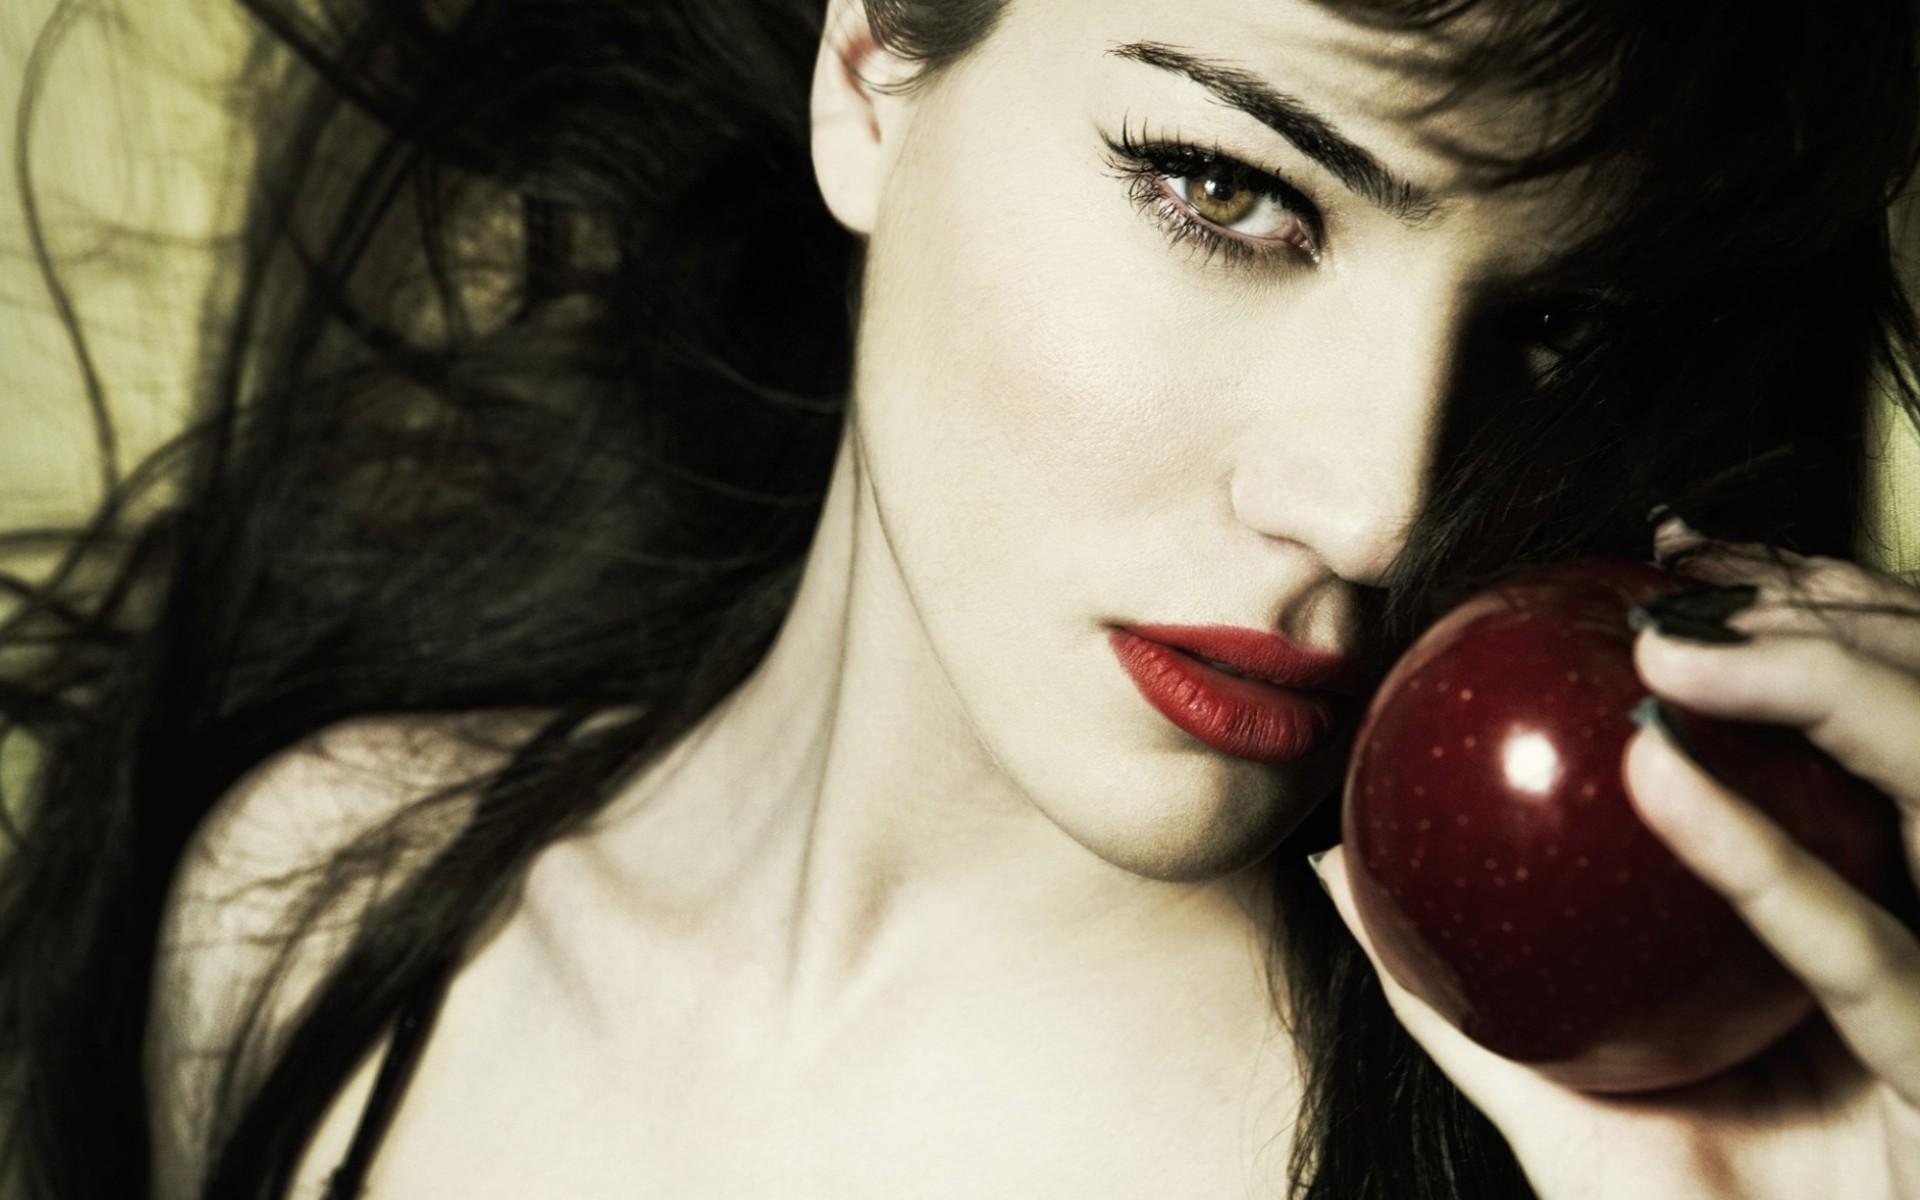 Retro Apple Wallpaper Iphone X Monica Bellucci Full Hd Wallpaper And Background Image